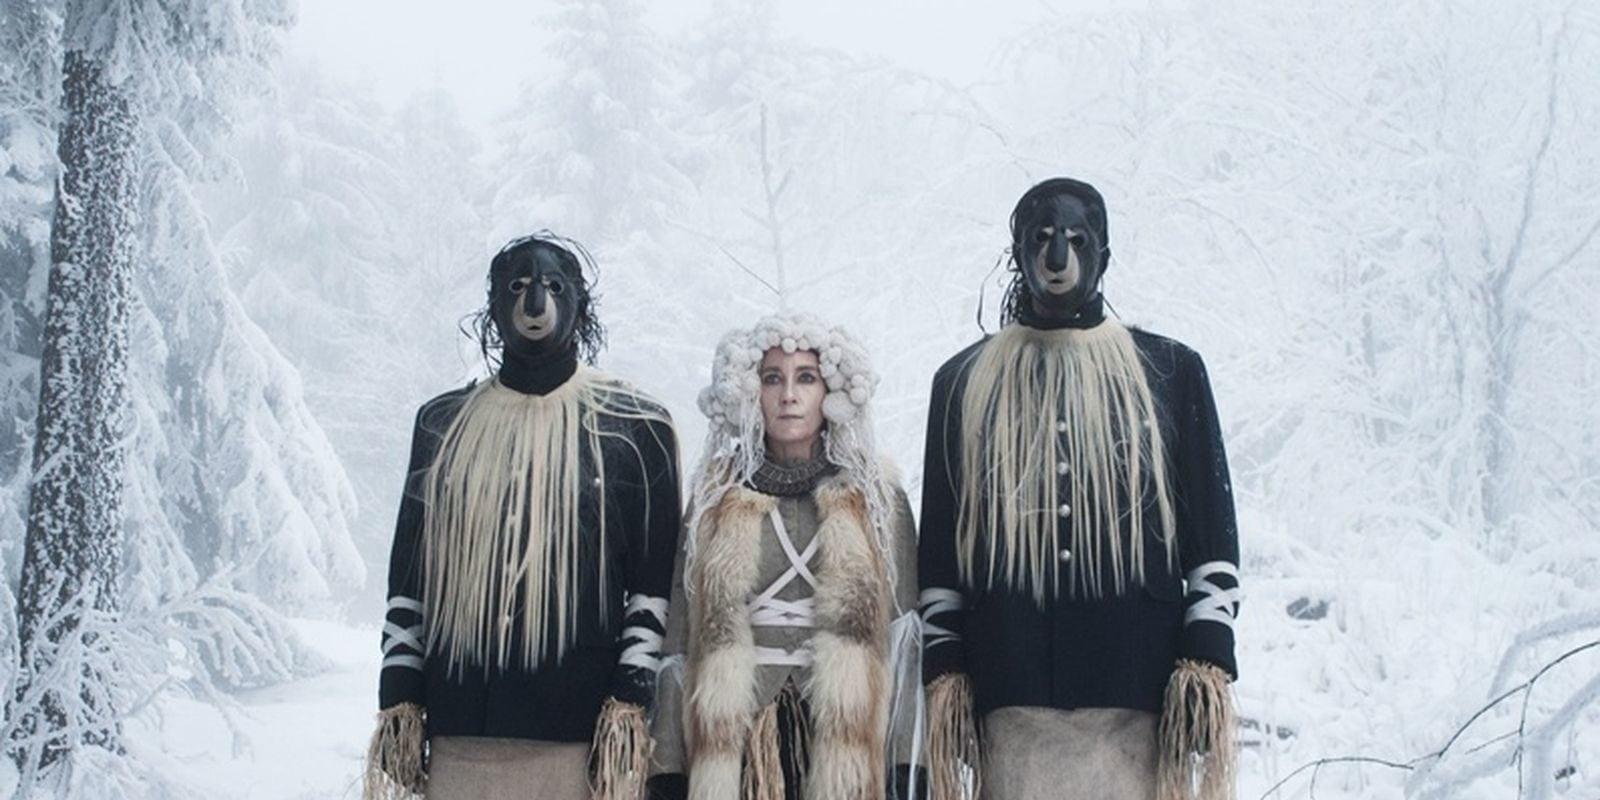 Mercredi, découverte de Rivers, premier album du trio strasbourgeois Polaroid3